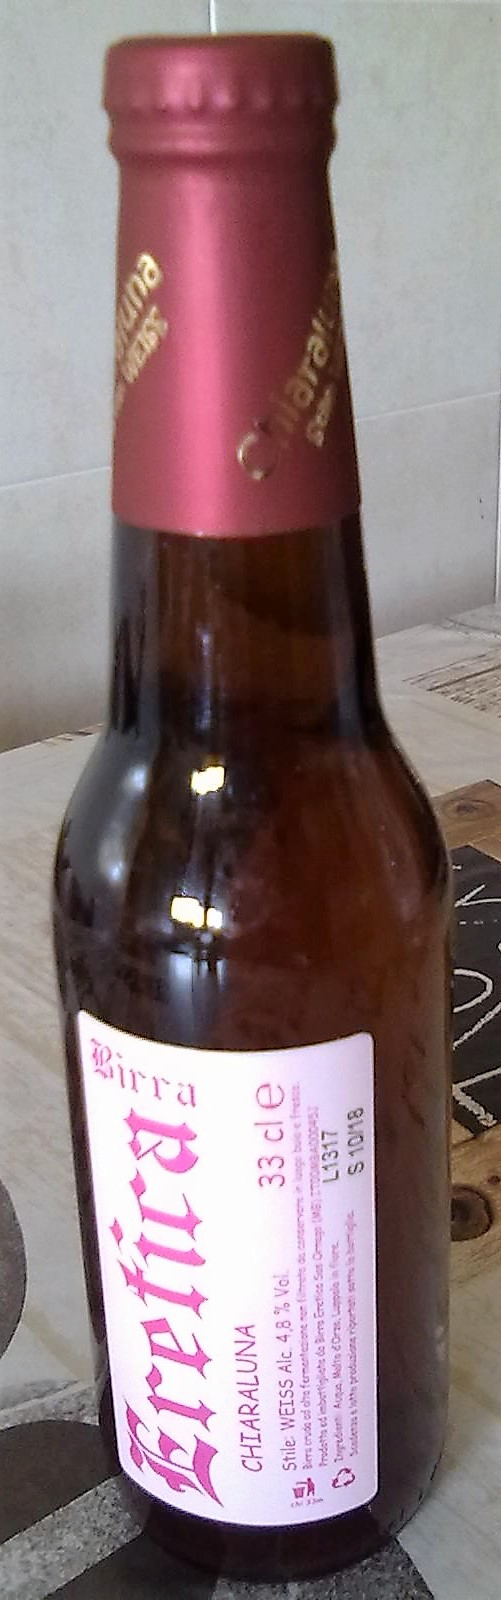 Birra chiaraluna - Eretica